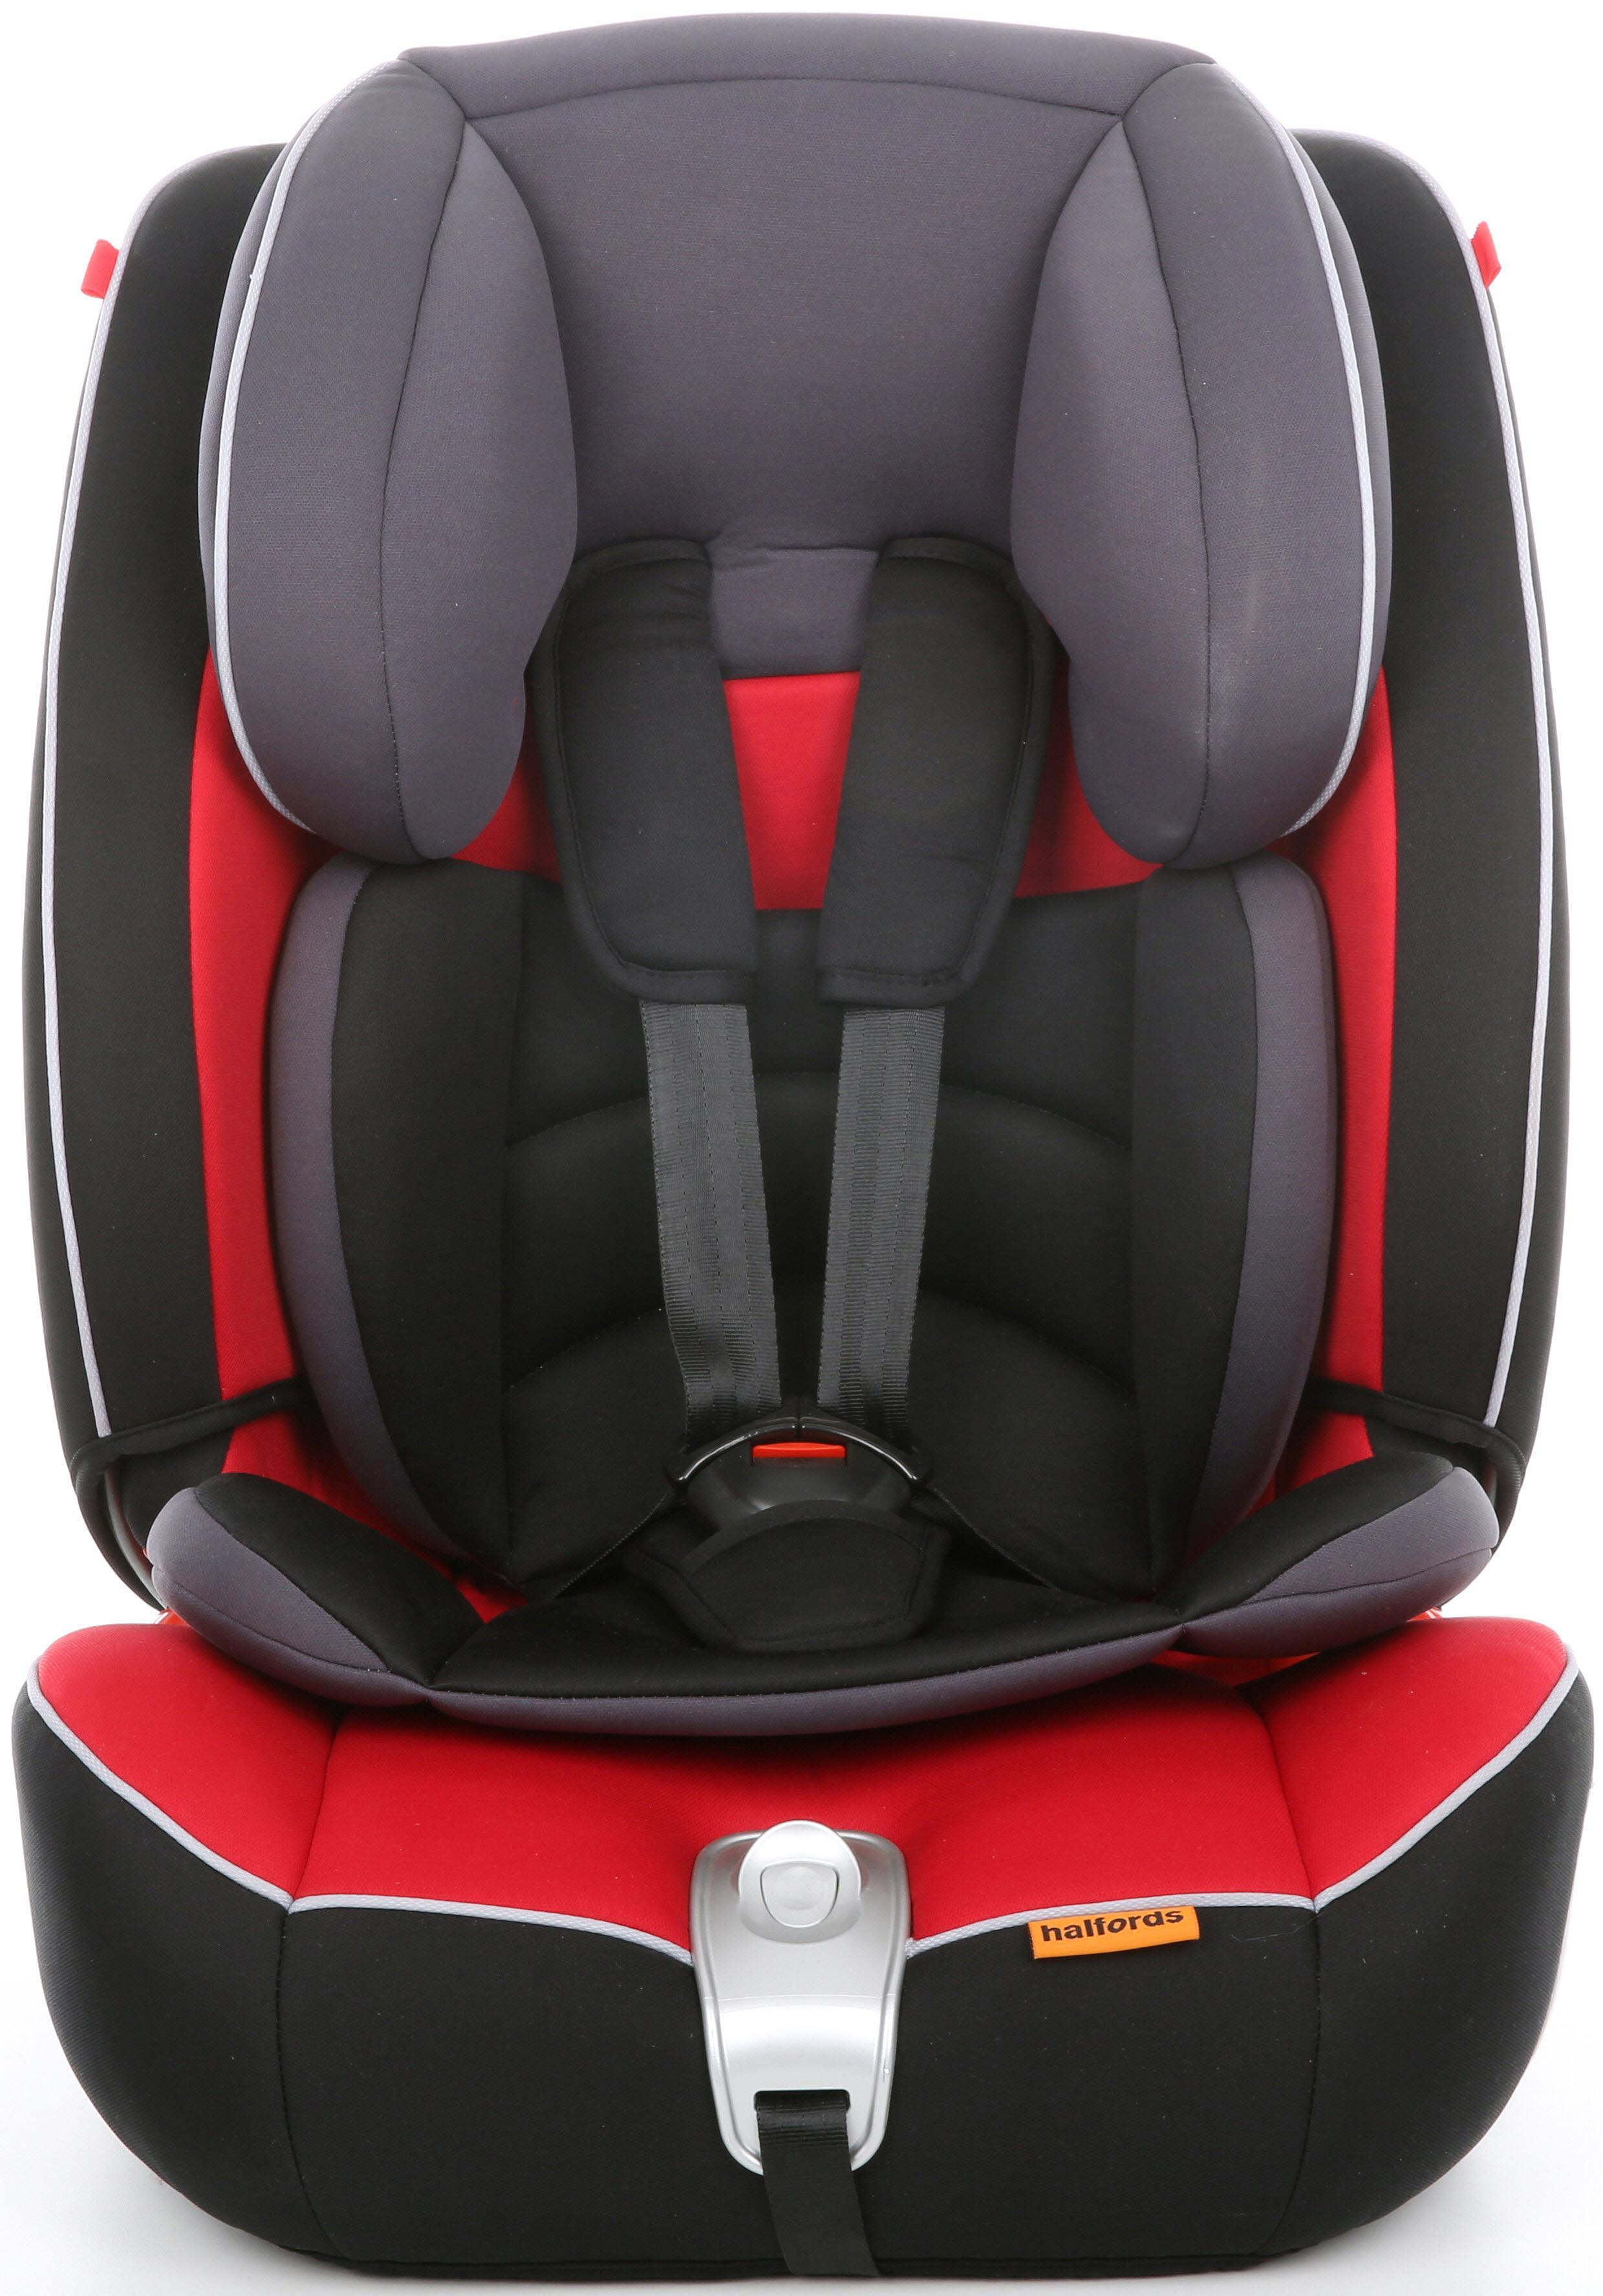 Lamborghini baby car seat